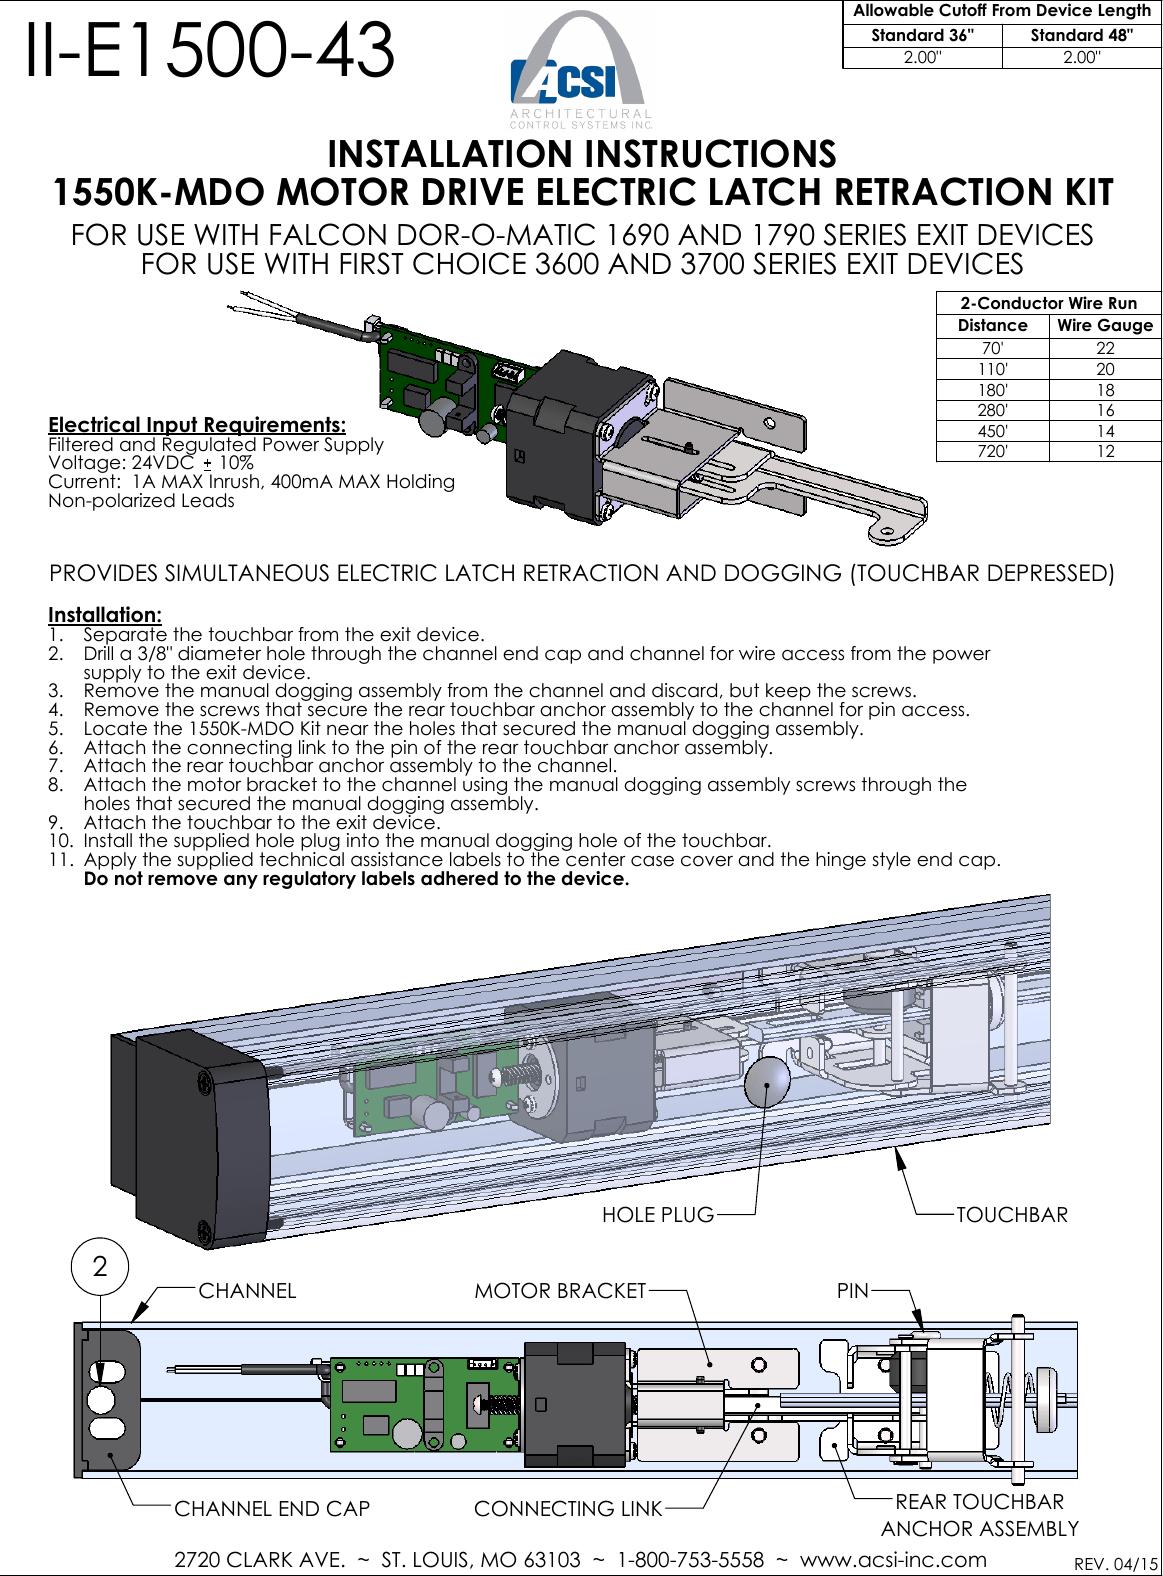 110 Electrical Wiring Diagram Acsi Ii E1500 43 1550k Mdo 2015 04 Falcon Dor O Matic 1690